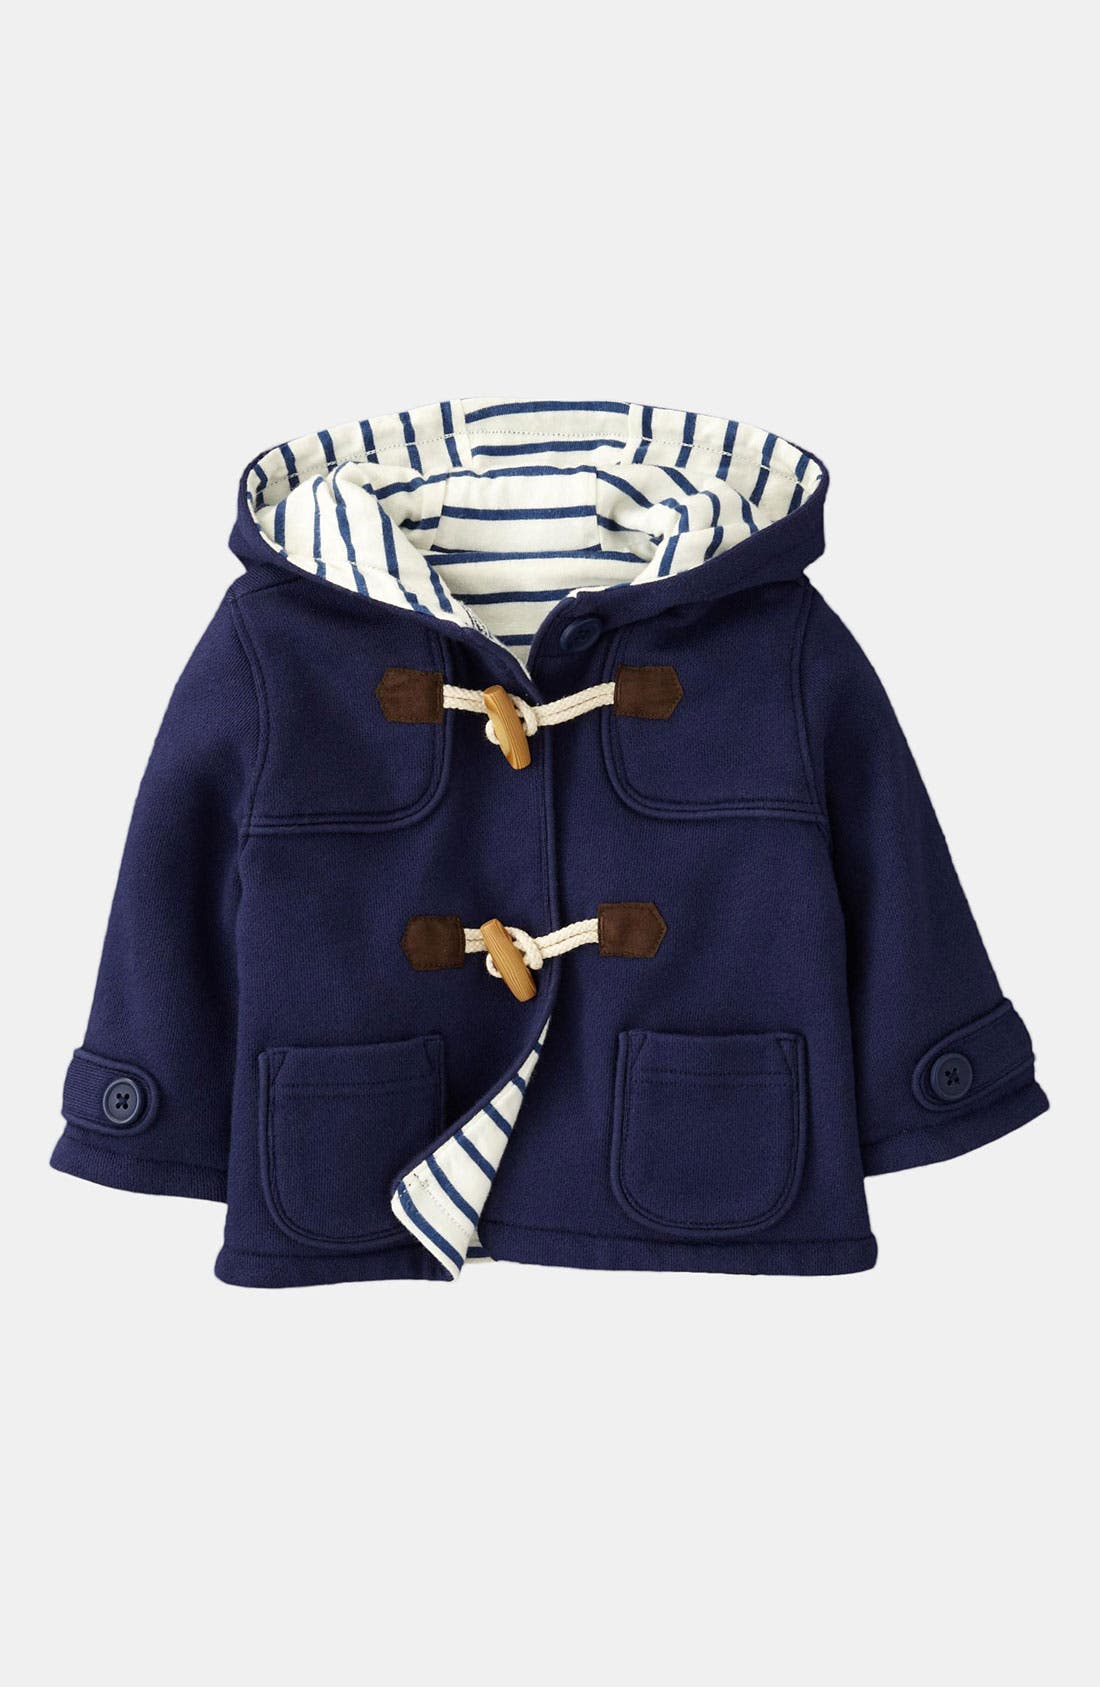 Alternate Image 1 Selected - Mini Boden Duffle Coat (Infant)